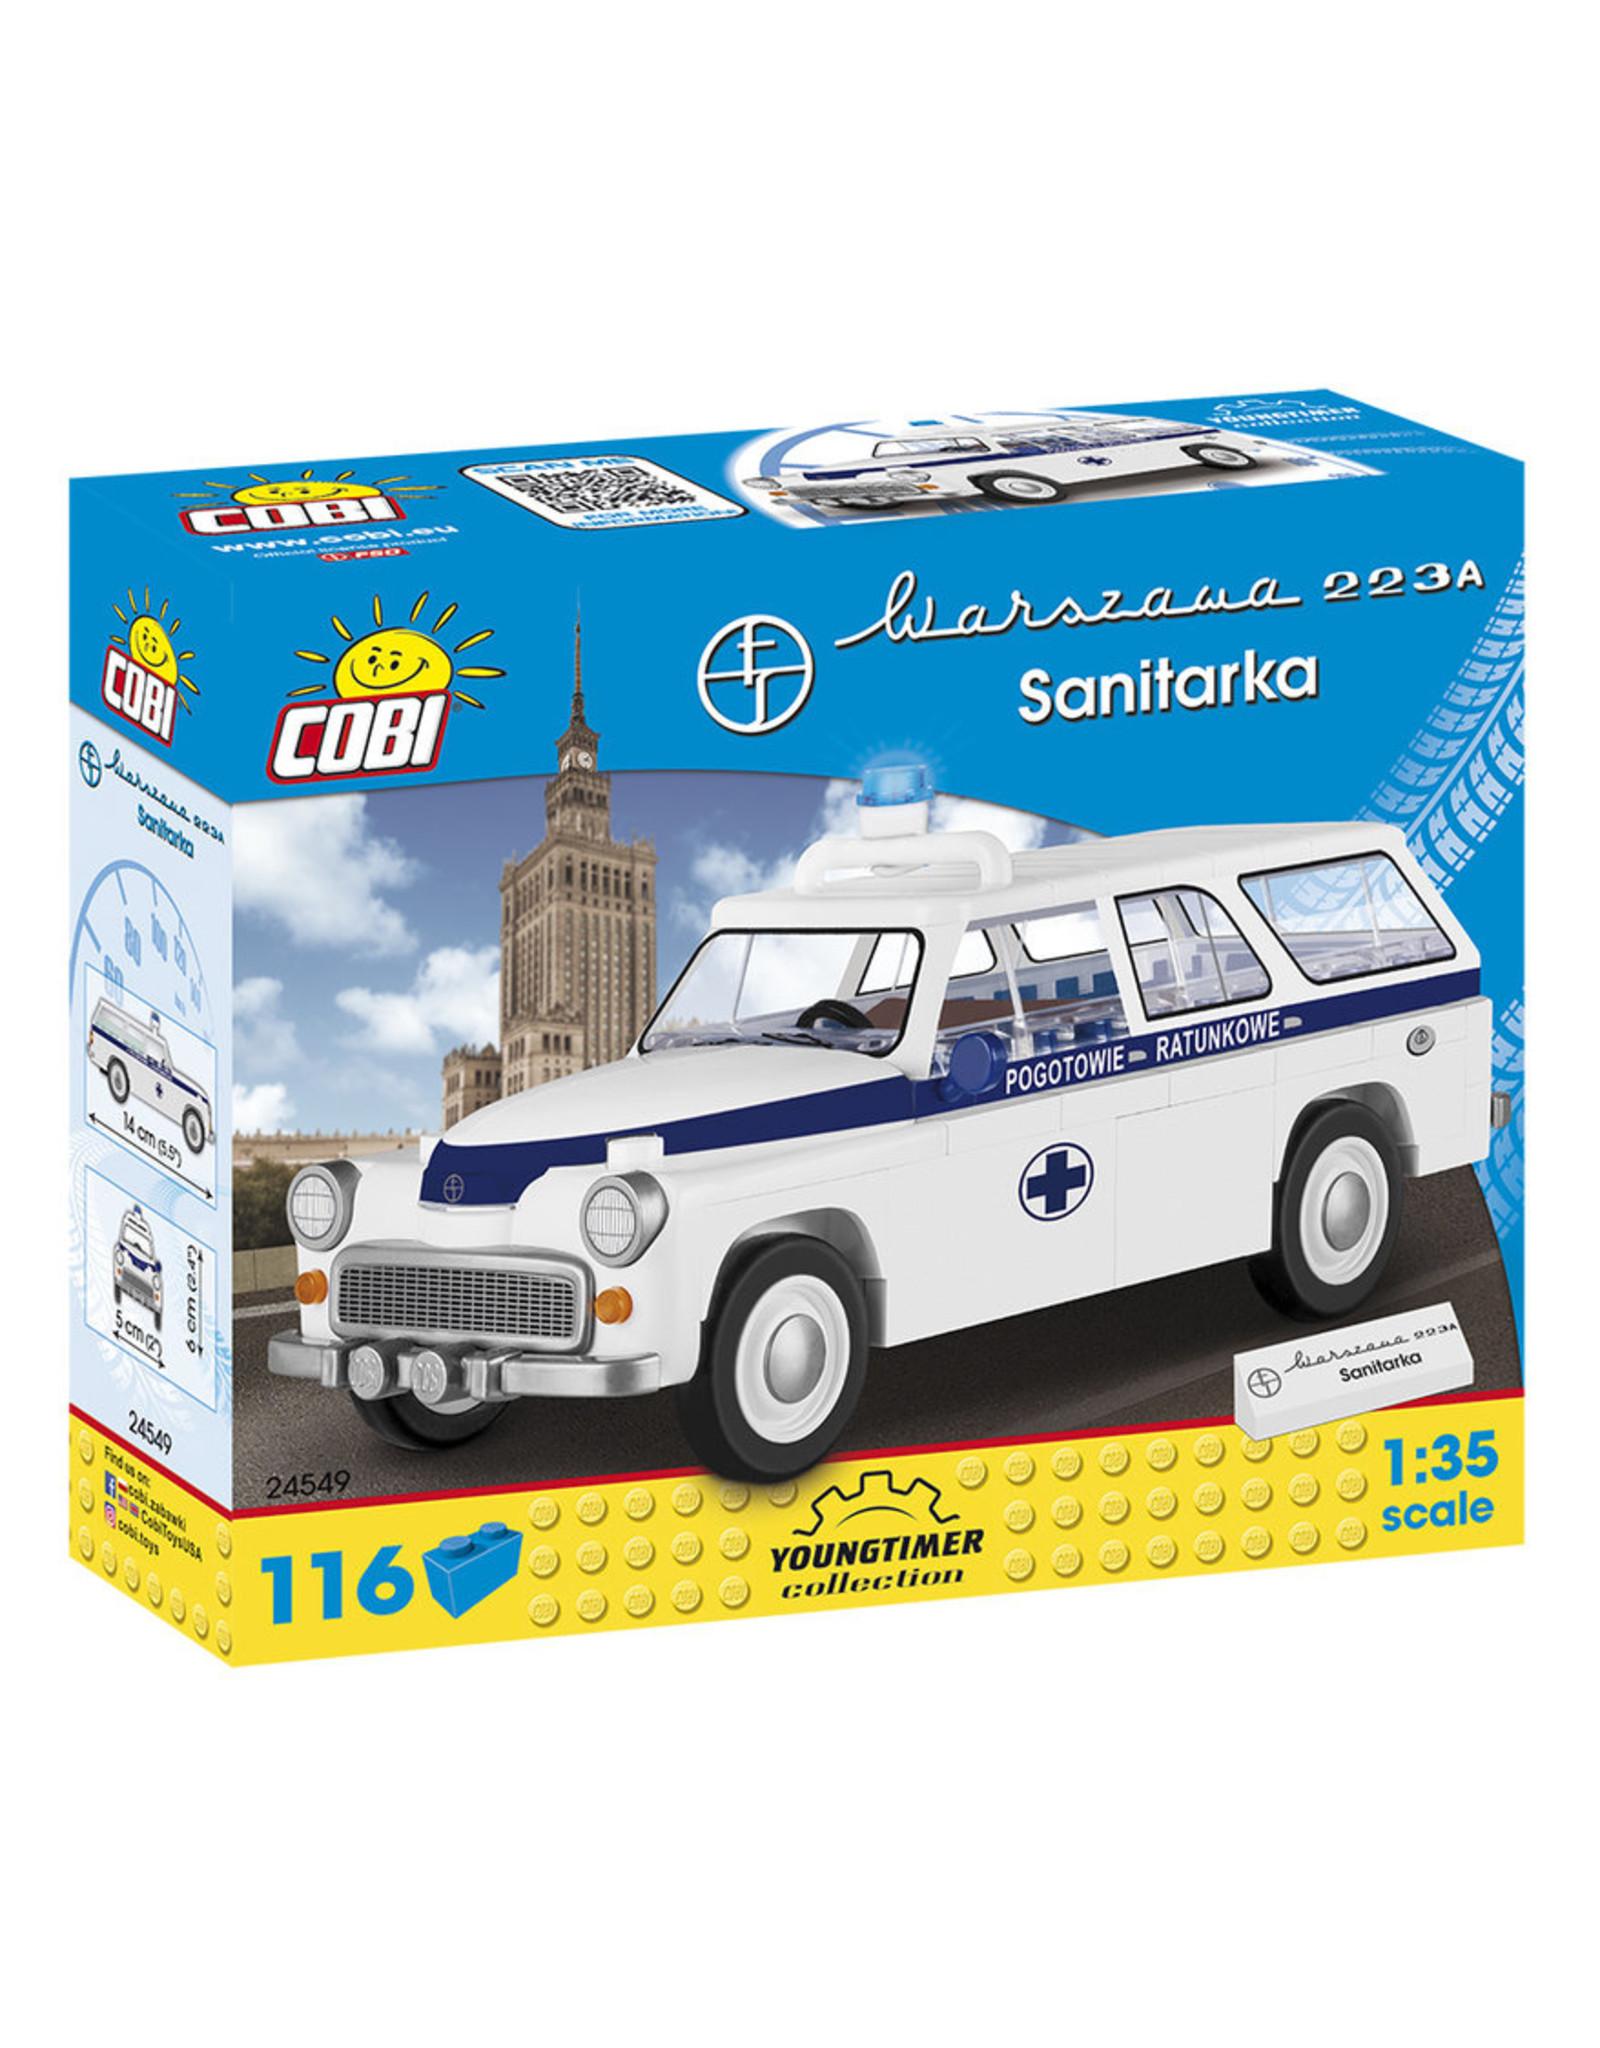 COBI COBI 24549 - Warszawa 223K Ambulance